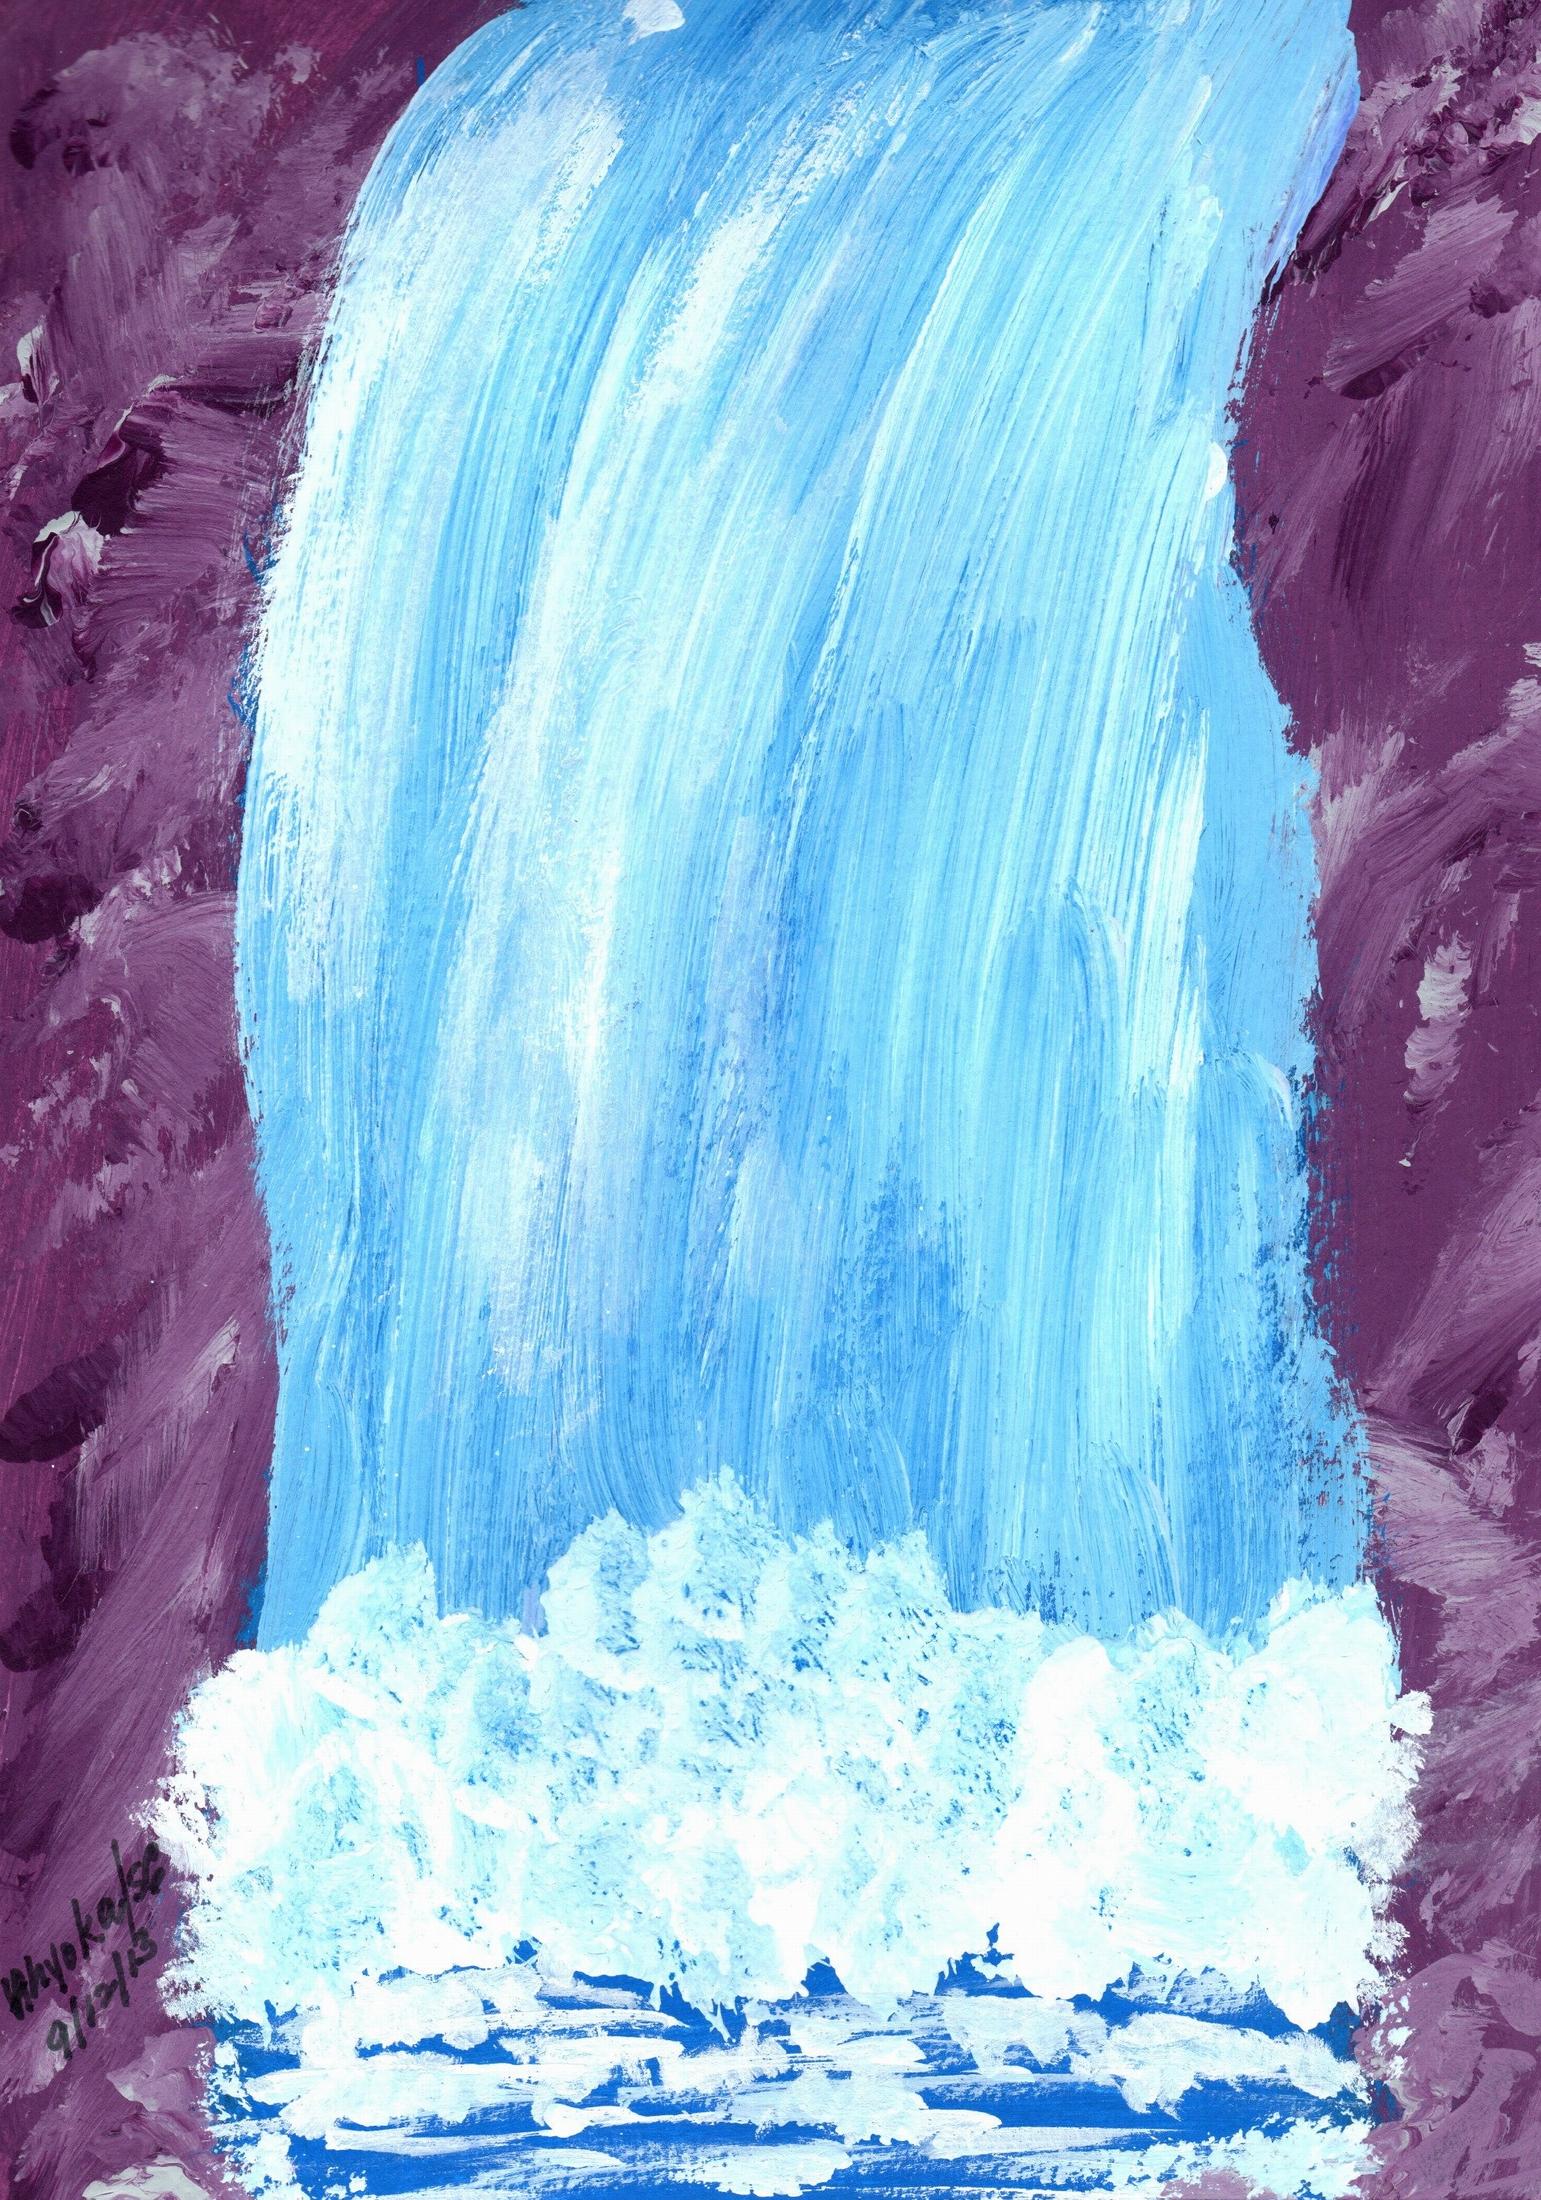 WATERFALL AT GARNET CLIFF